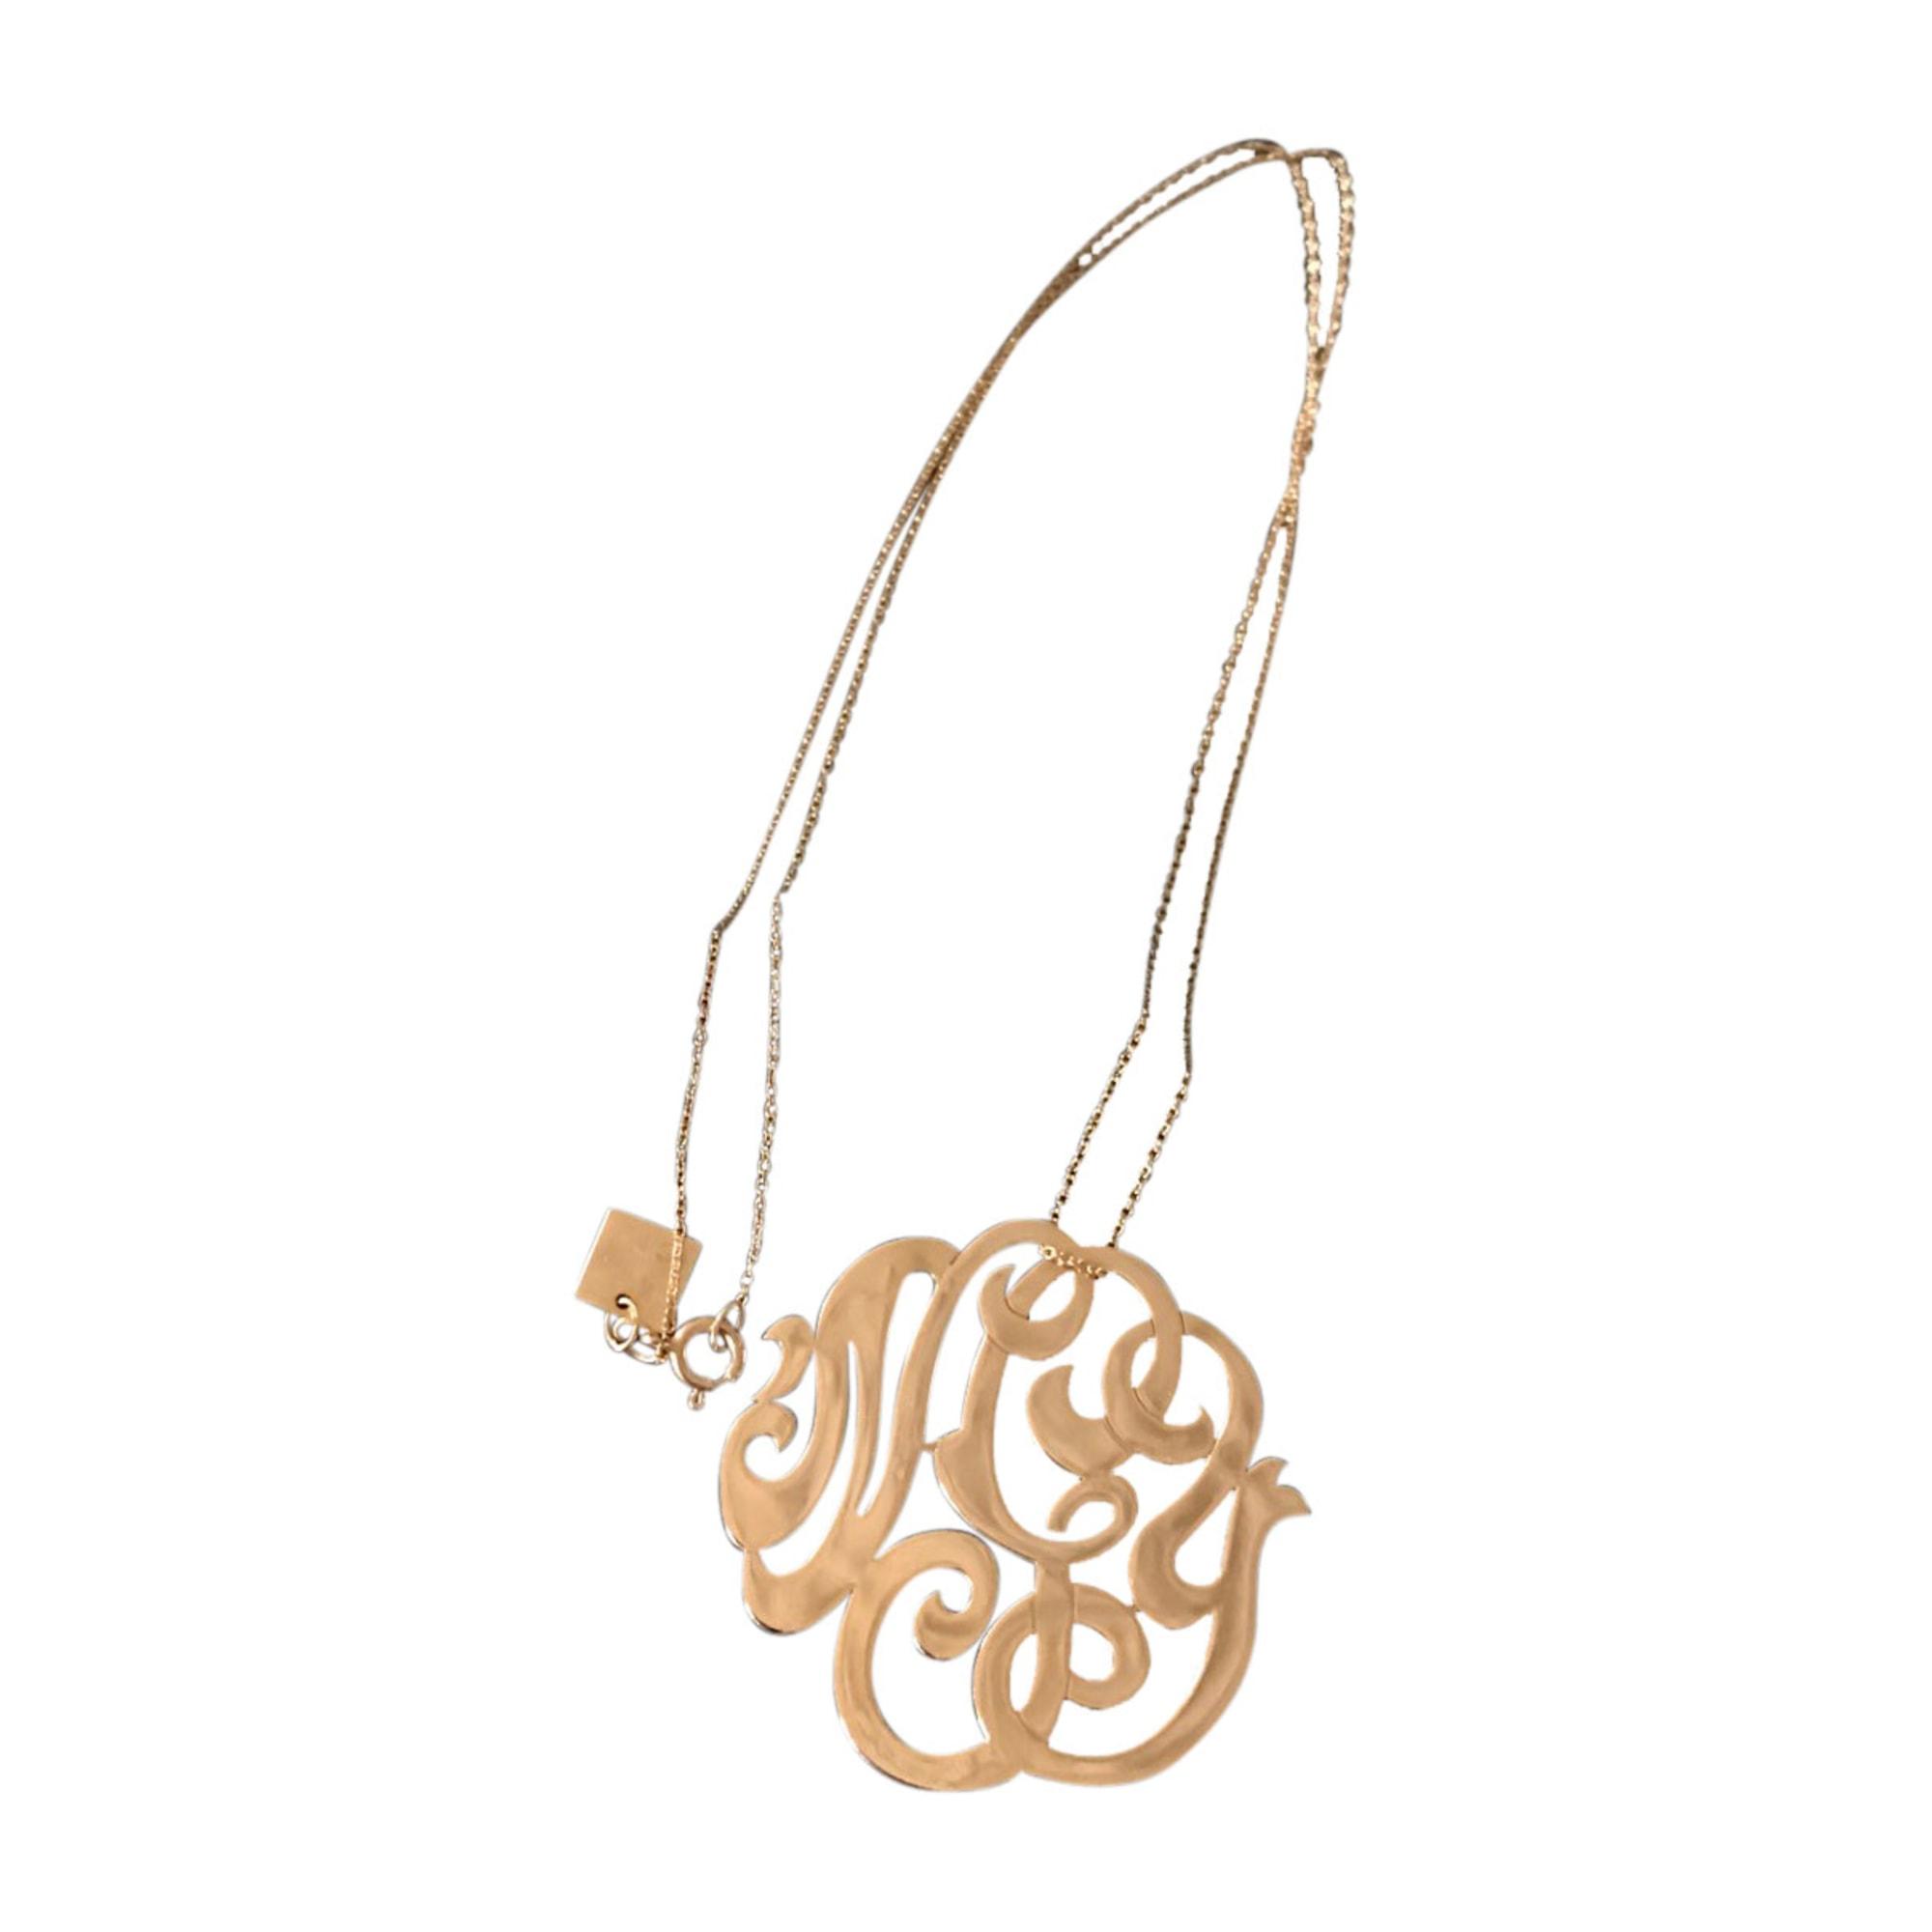 Pendentif, collier pendentif GINETTE NY Doré, bronze, cuivre